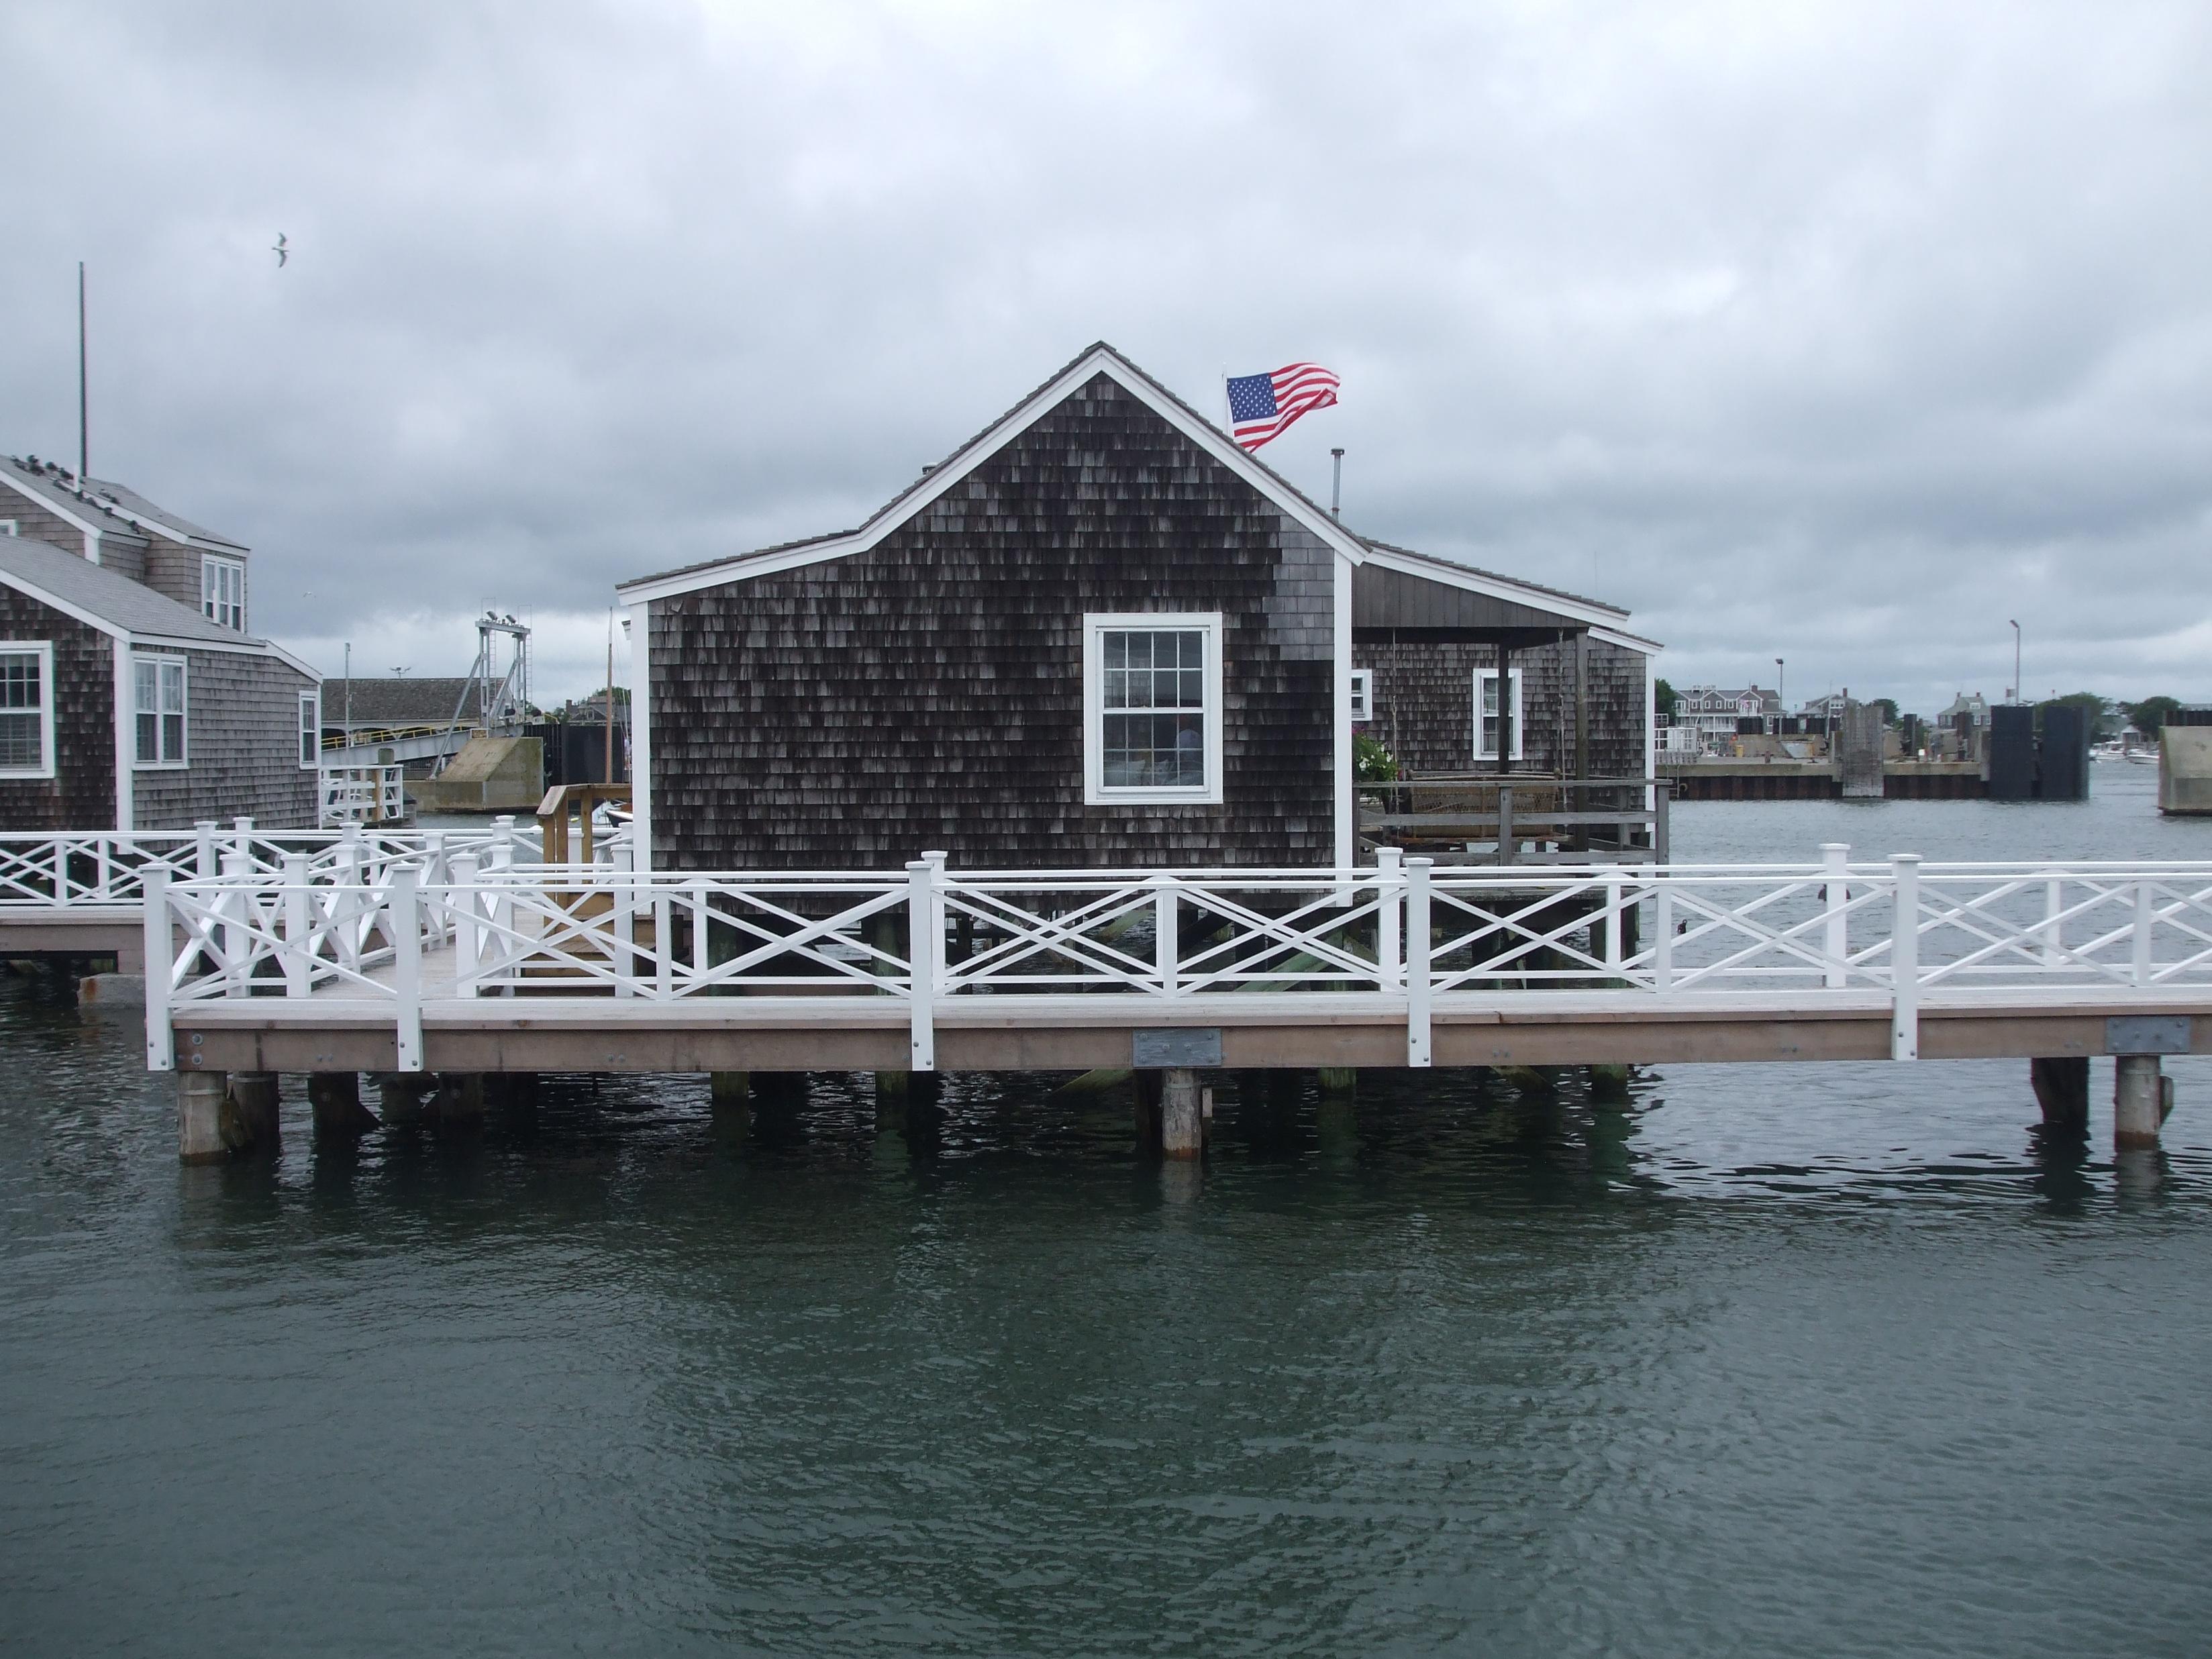 file nantucket harbor old north wharf wharf shack ma. Black Bedroom Furniture Sets. Home Design Ideas